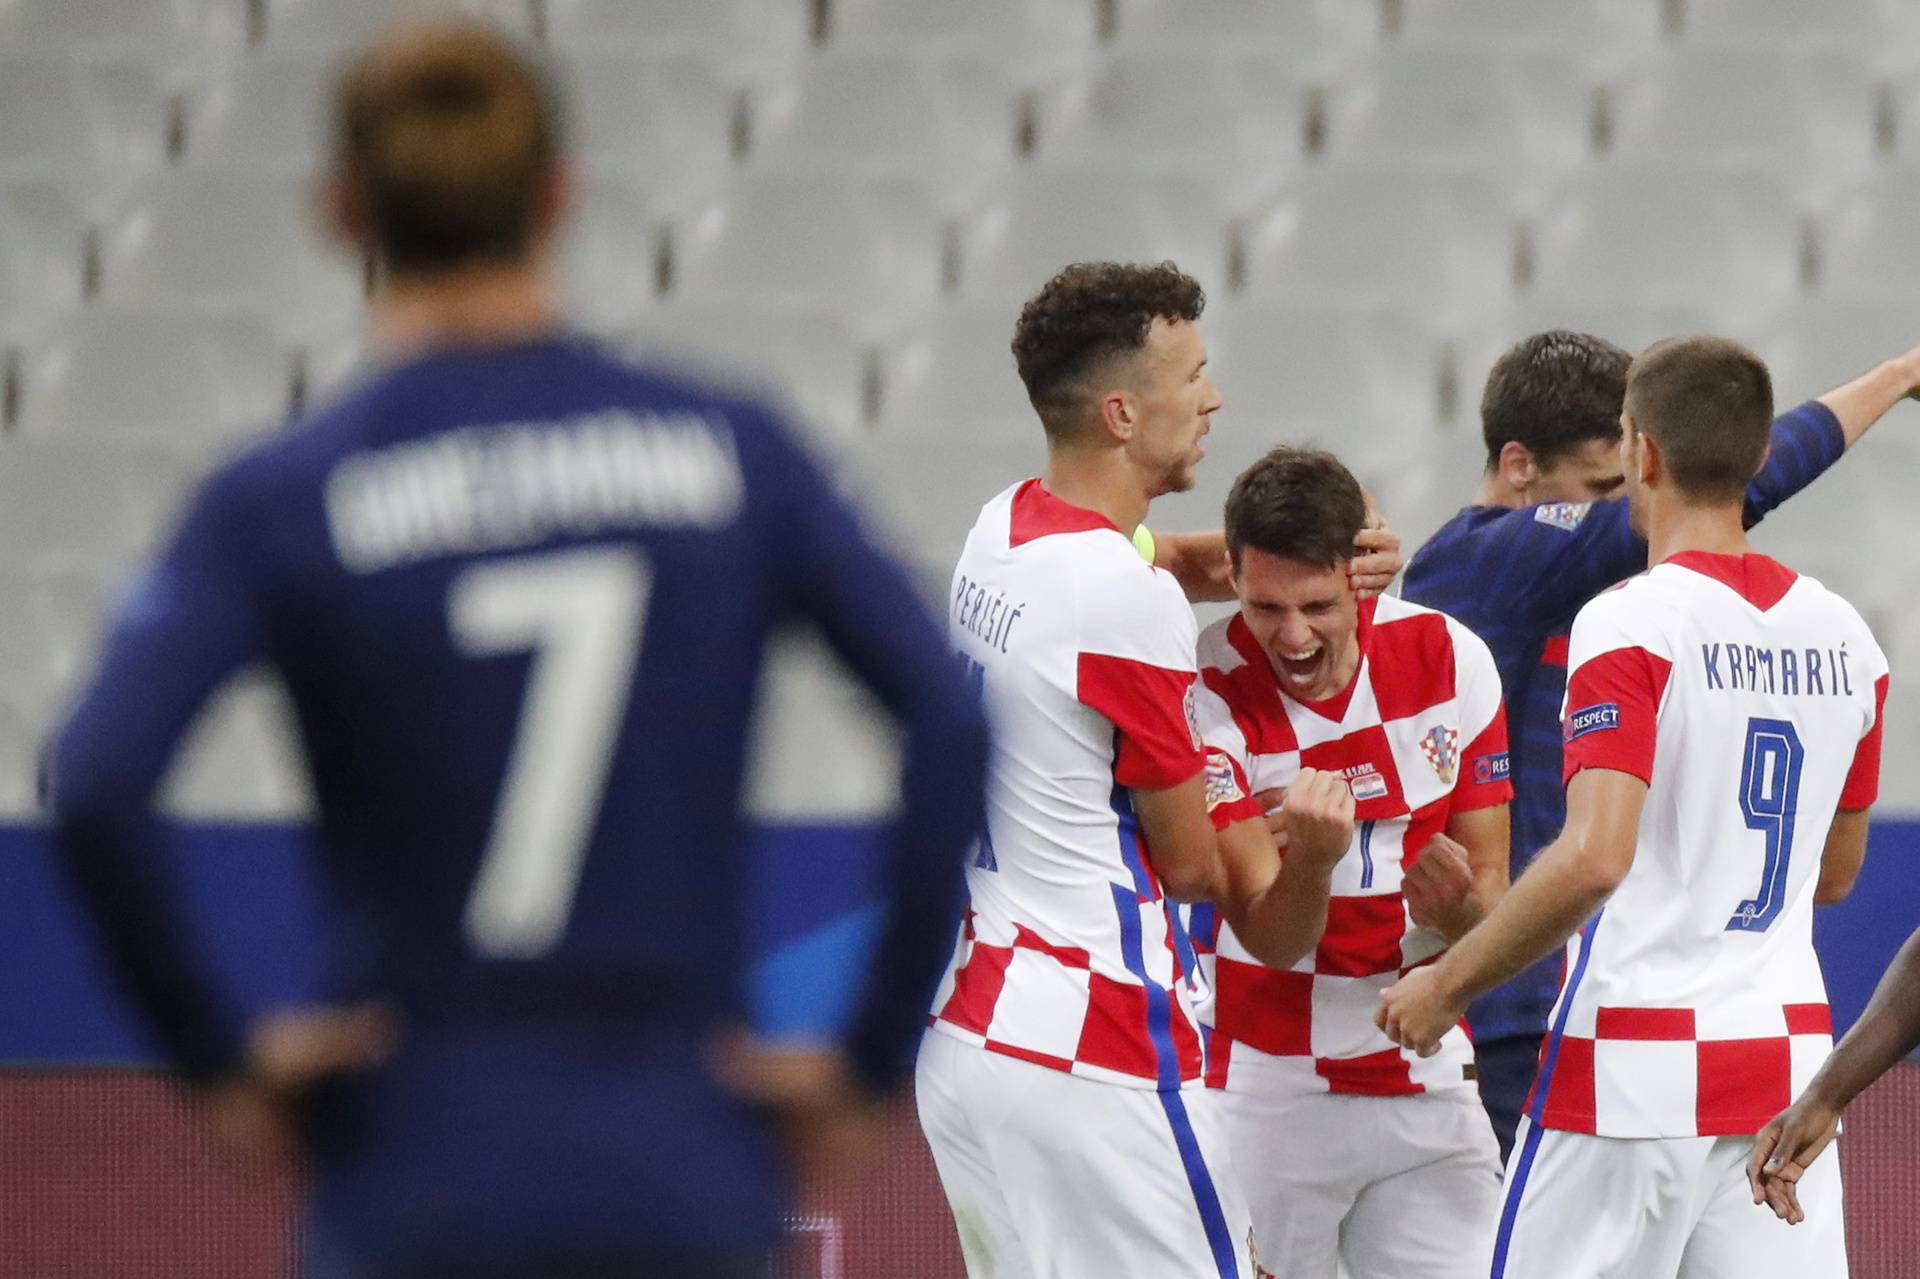 UEFA Nations League - League A - Group 3 - France v Croatia